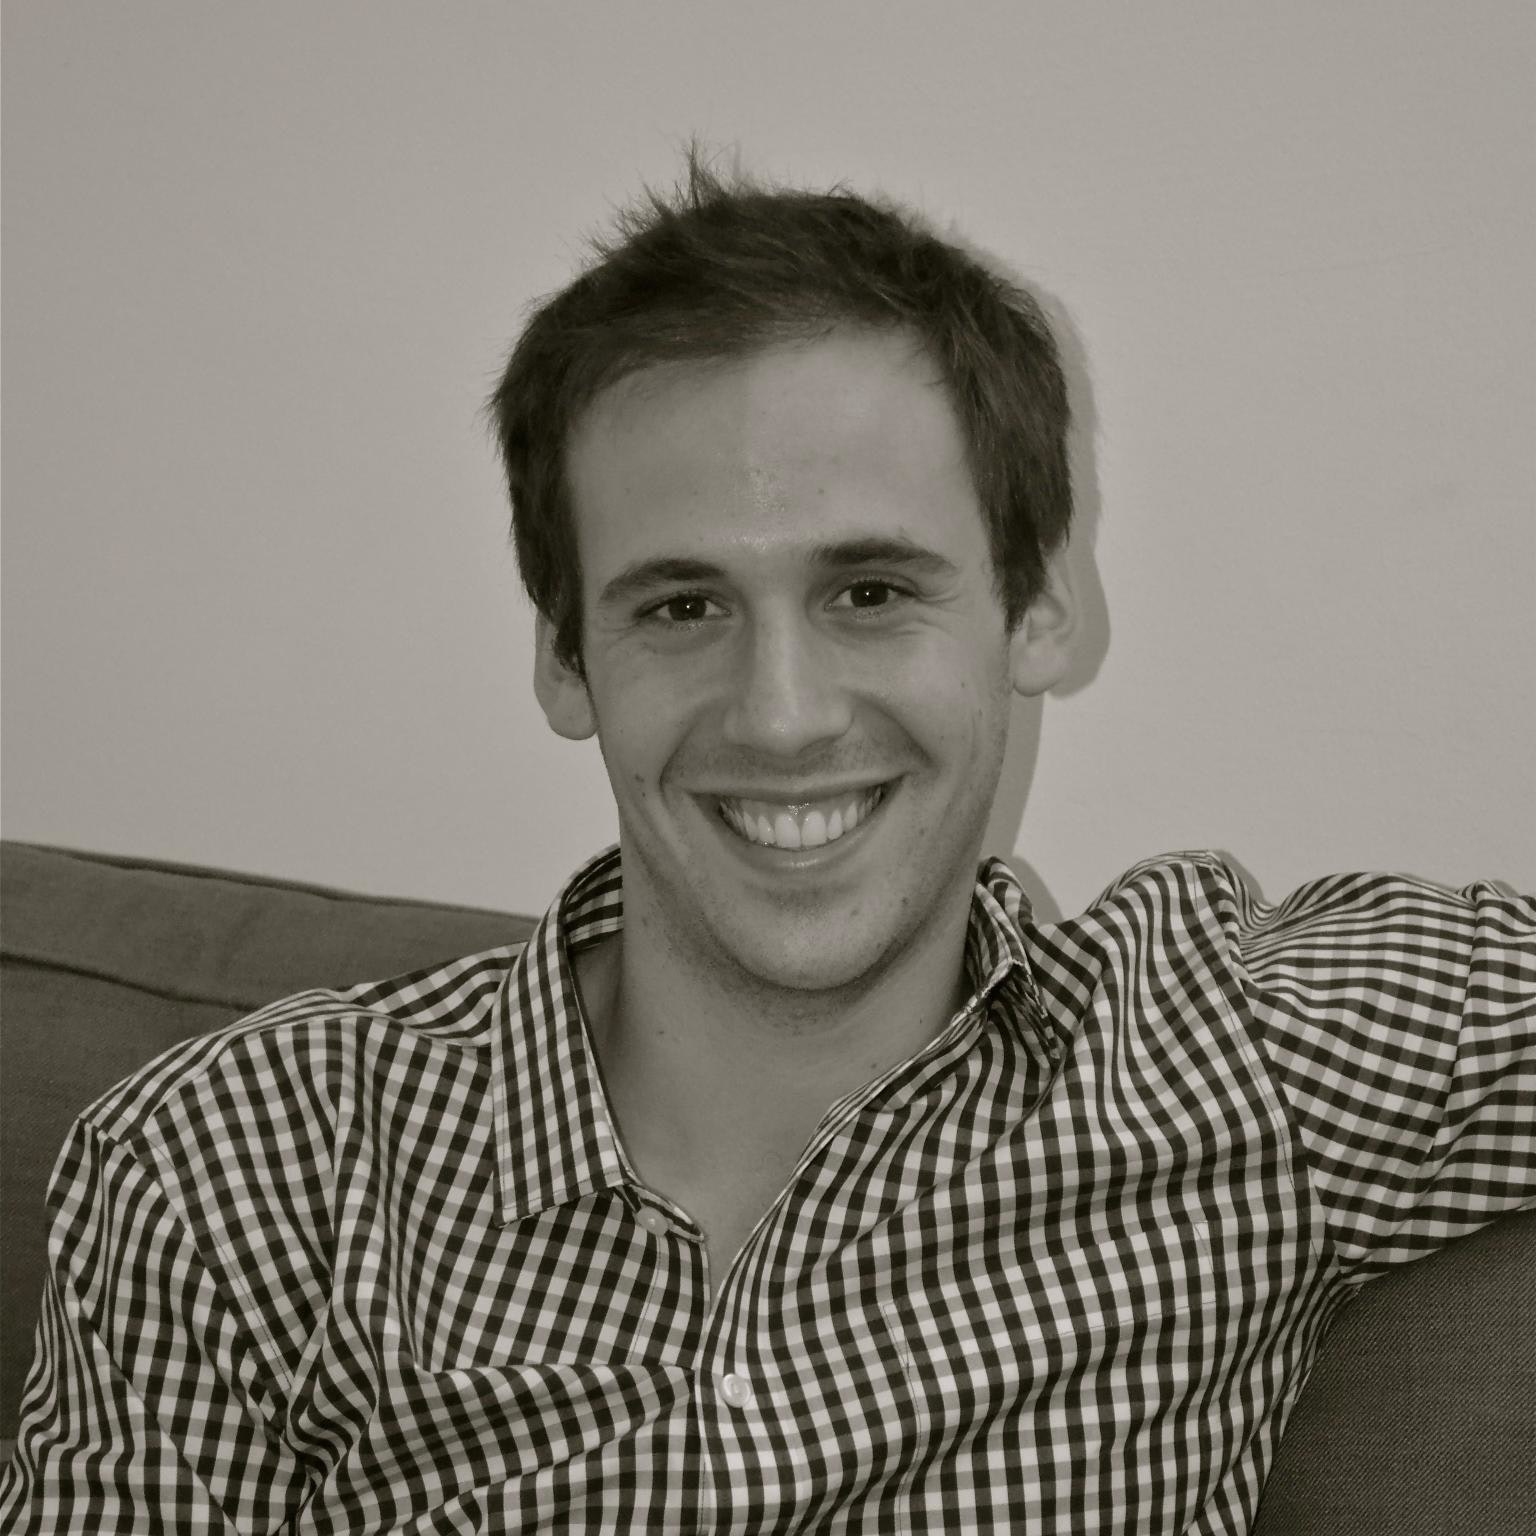 Dani Forman